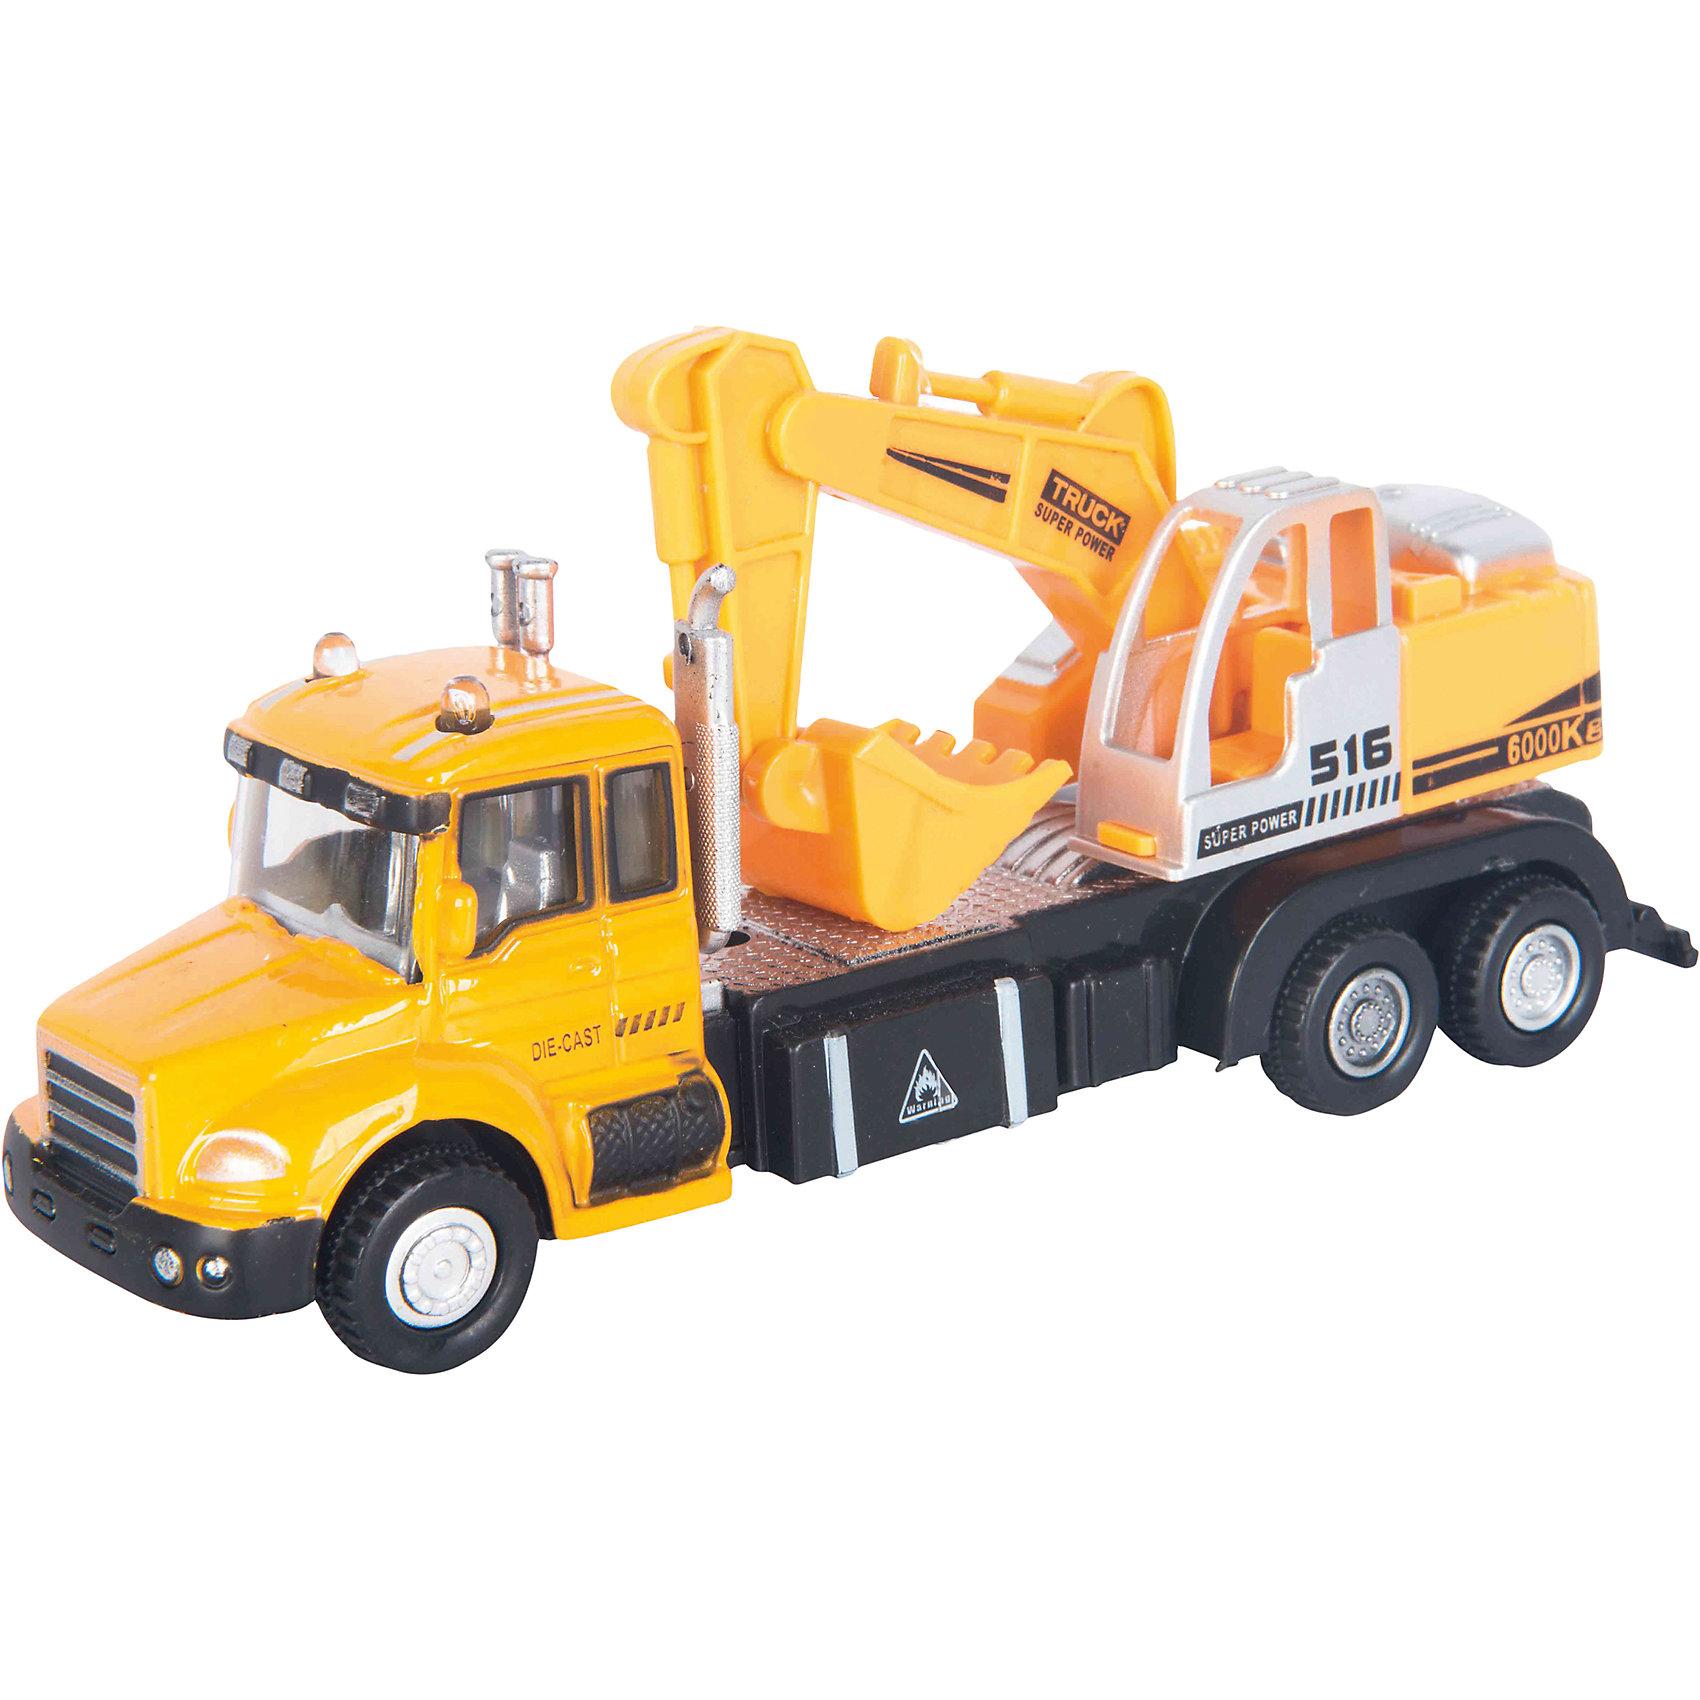 Машинка Excavator Truck с экскаватором 1:48, AutotimeМашинки<br><br><br>Ширина мм: 165<br>Глубина мм: 57<br>Высота мм: 75<br>Вес г: 13<br>Возраст от месяцев: 36<br>Возраст до месяцев: 2147483647<br>Пол: Мужской<br>Возраст: Детский<br>SKU: 5584047